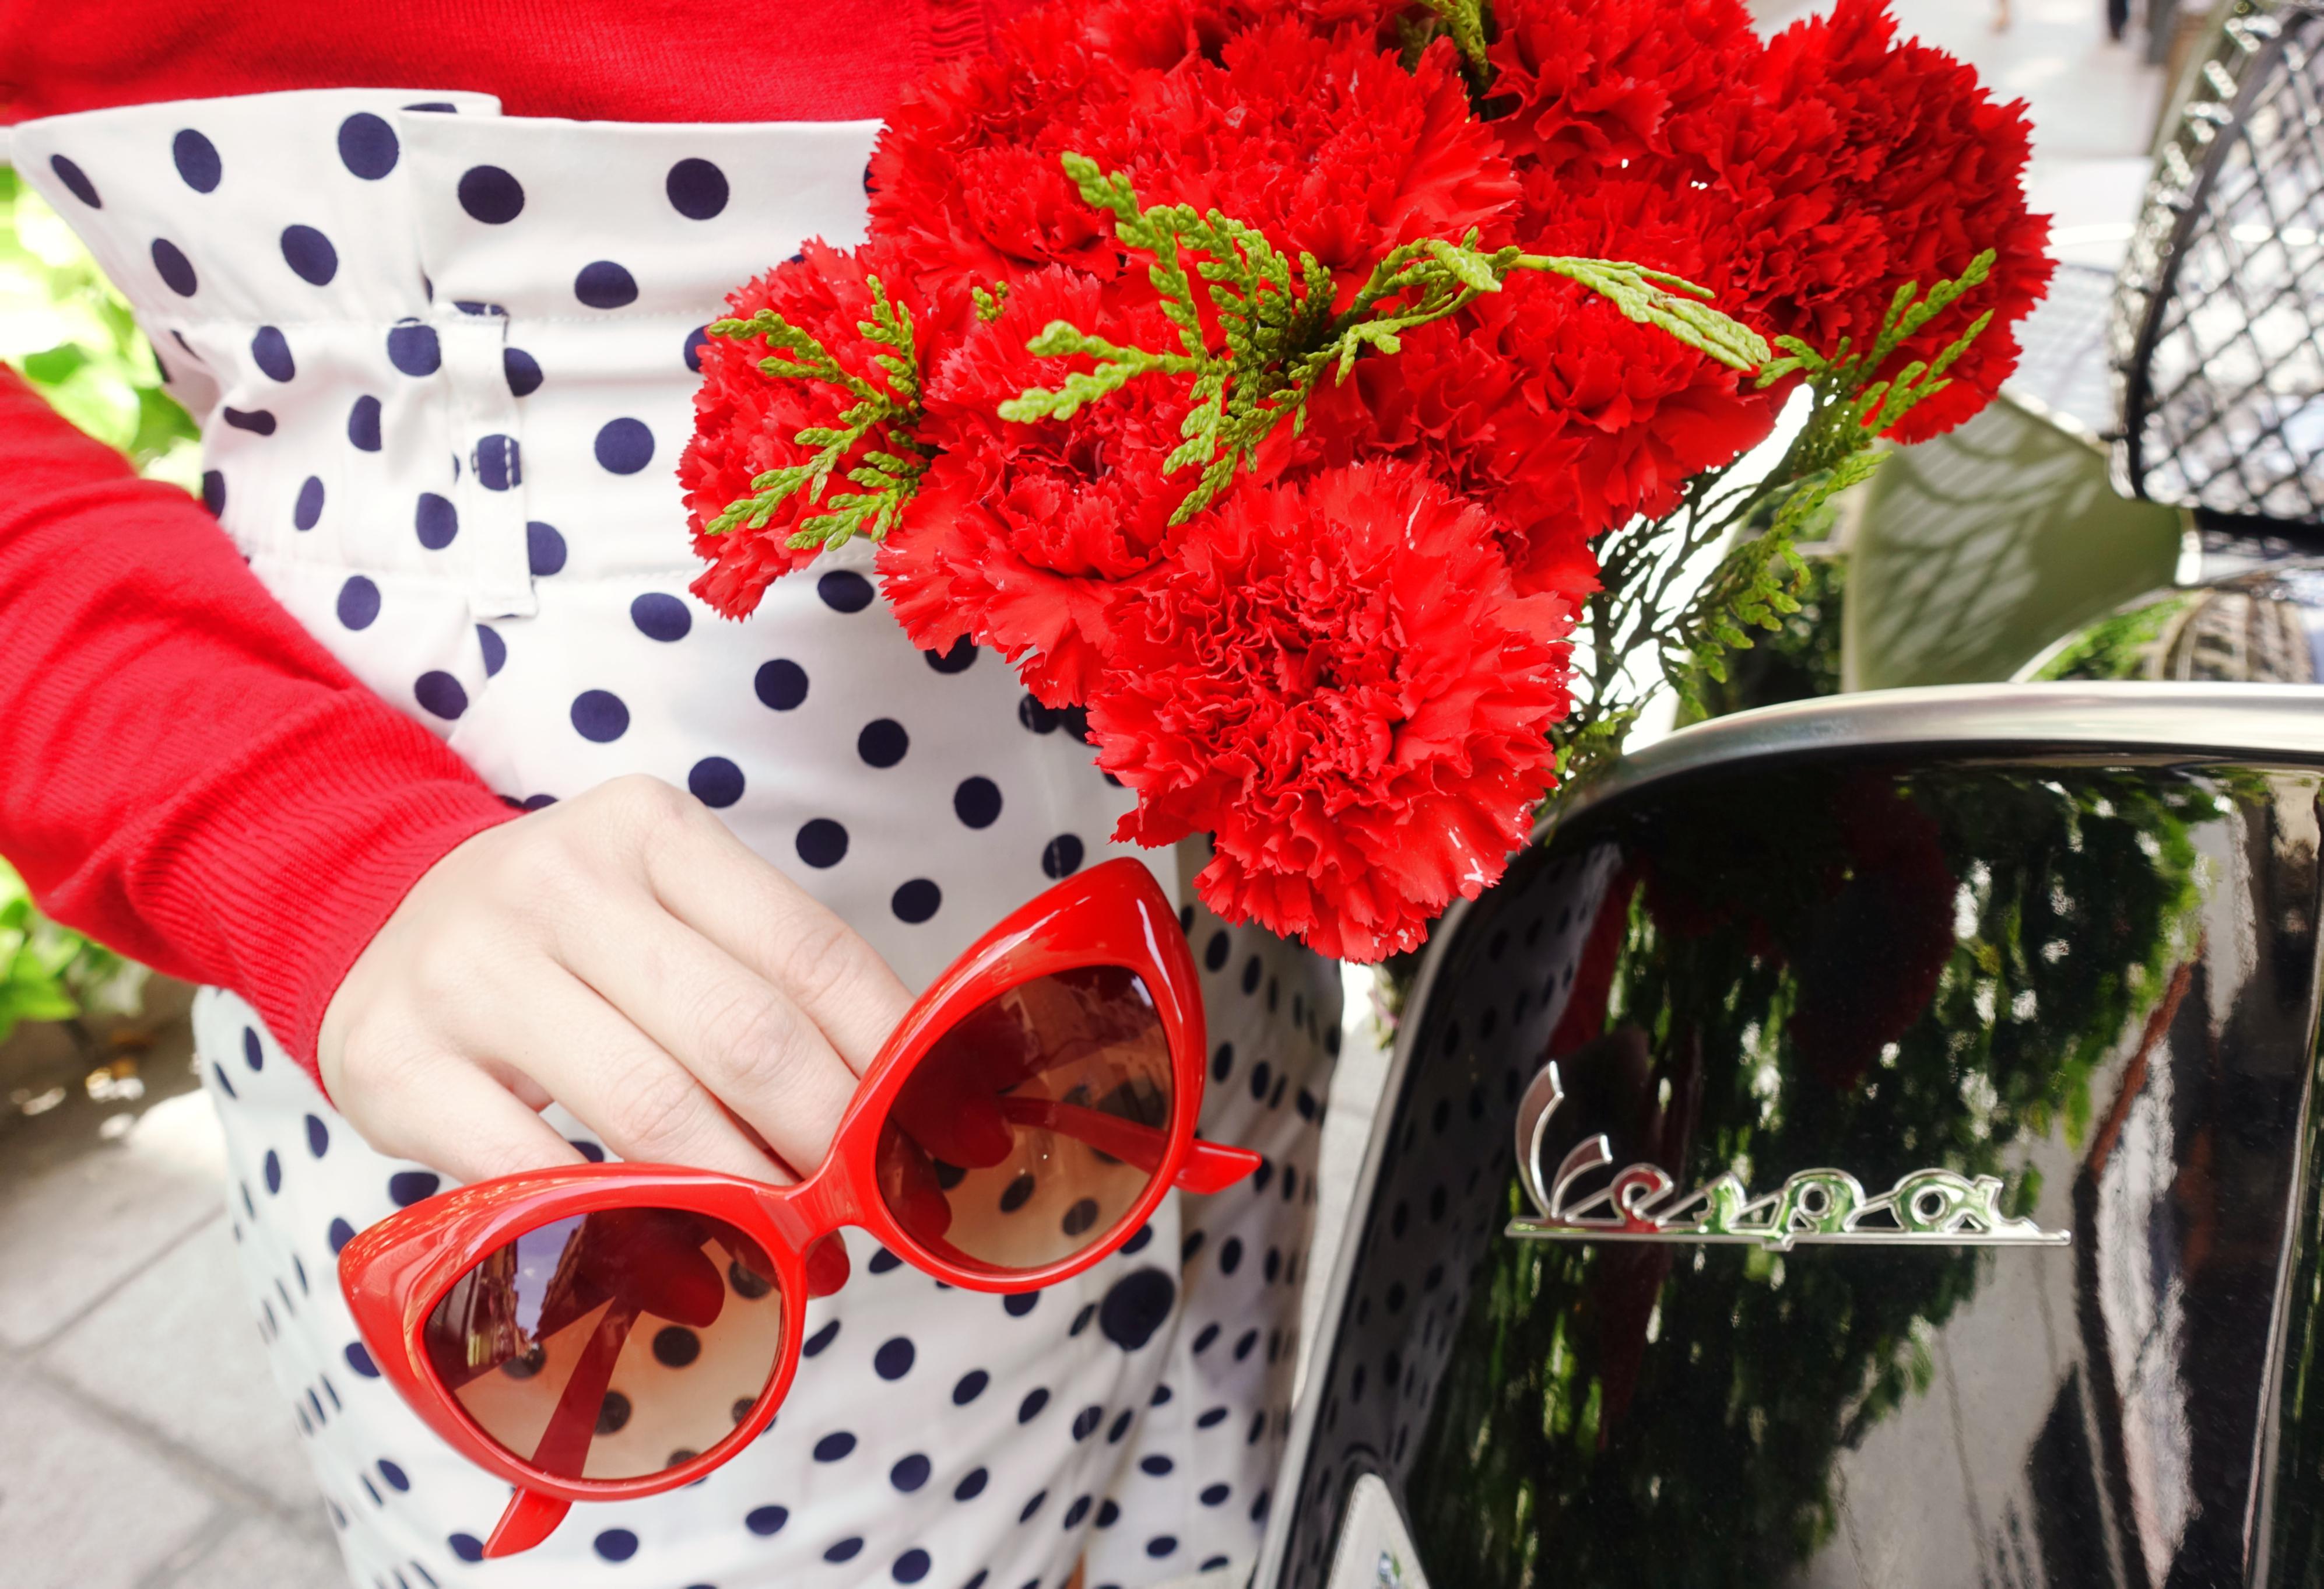 Vespa-style-retro-sunglasses-ChicAdicta-blog-de-moda-influencer-Madrid-Chic-Adicta-PiensaenChic-polkadot-Piensa-en-Chic